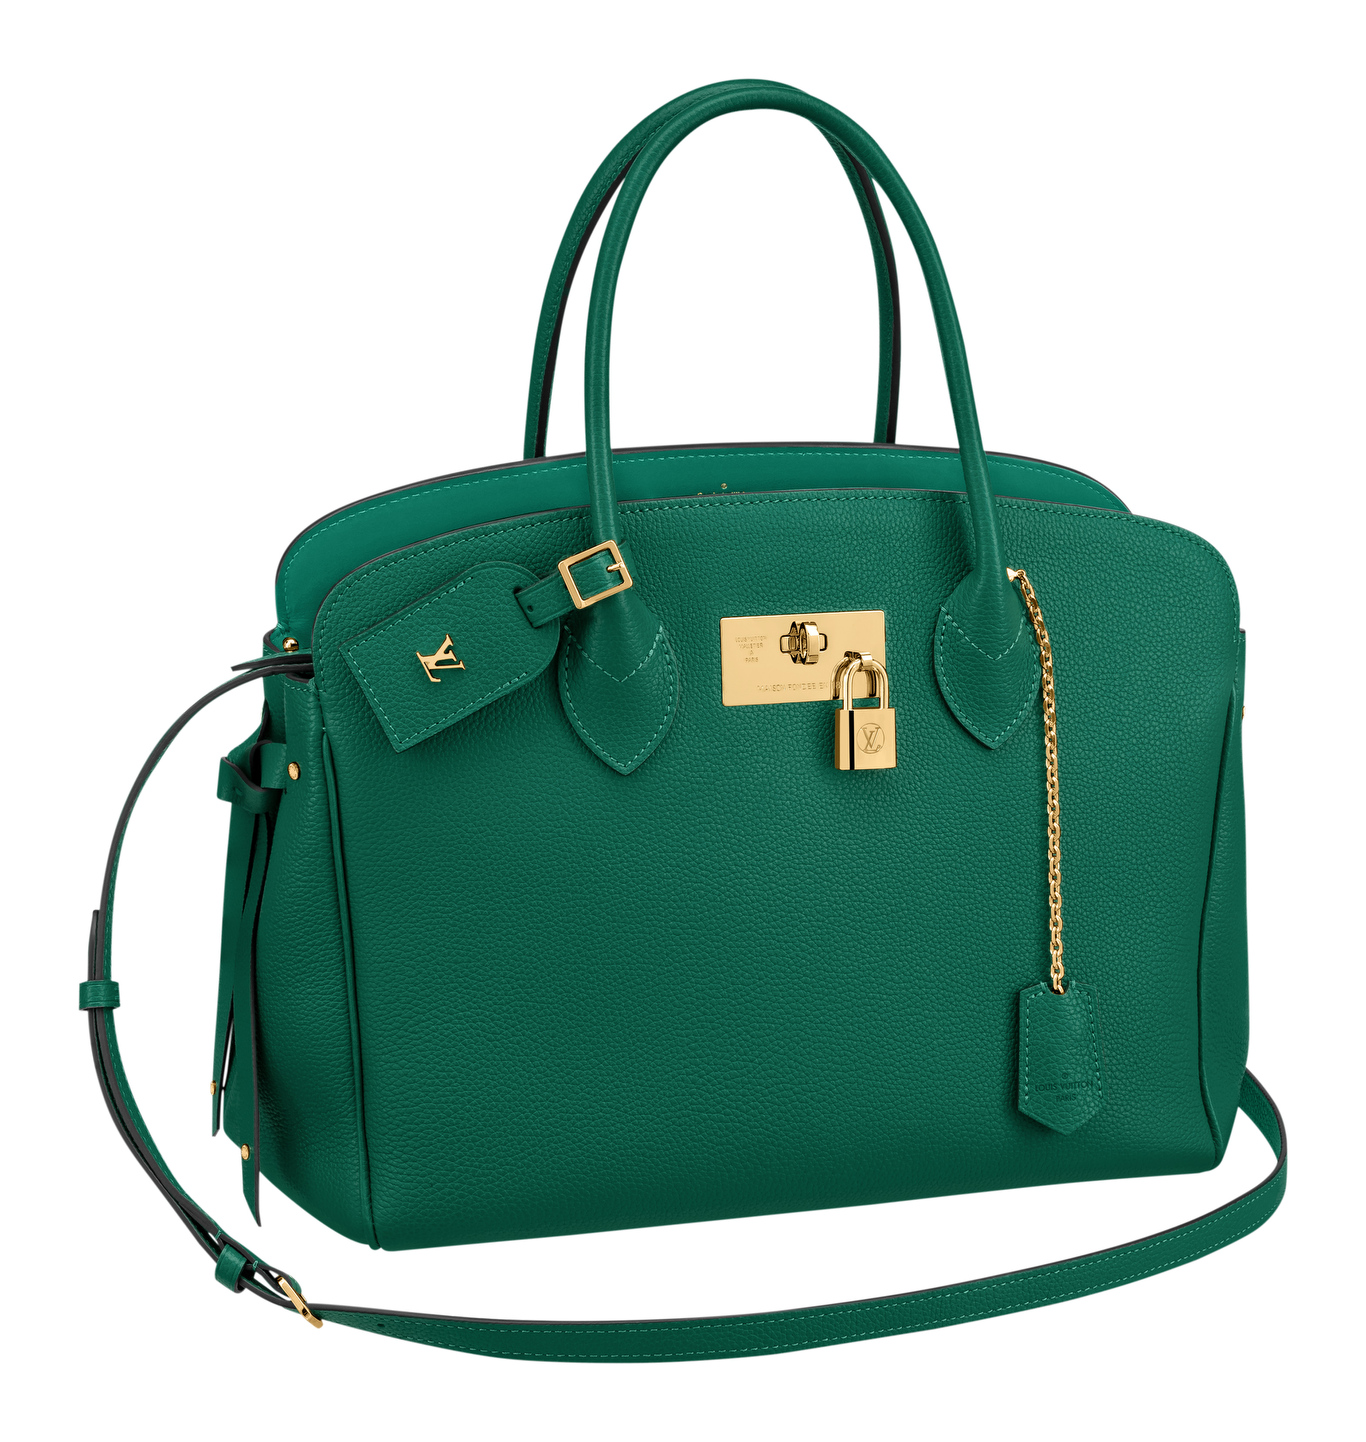 Louis VuittonÕs high-end leather bag ÔThe MillaÕ